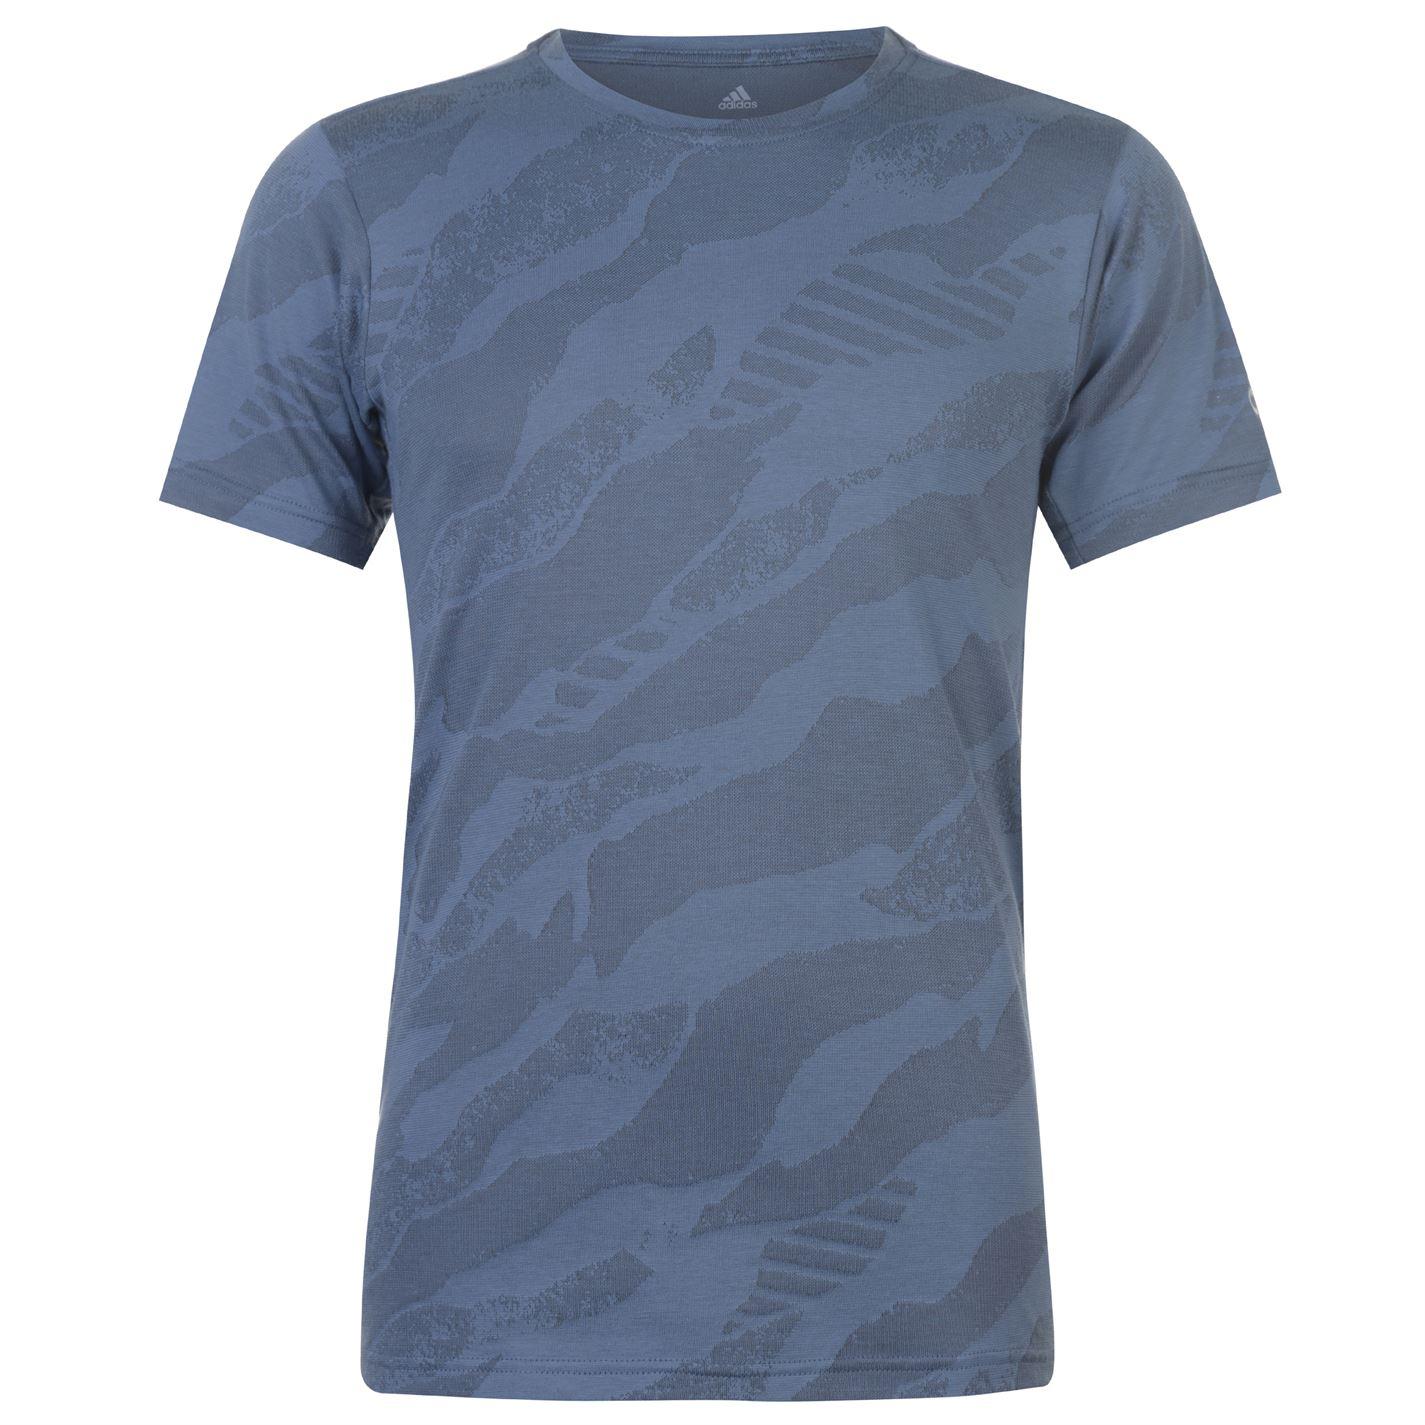 Adidas Free Lift T Shirt Mens